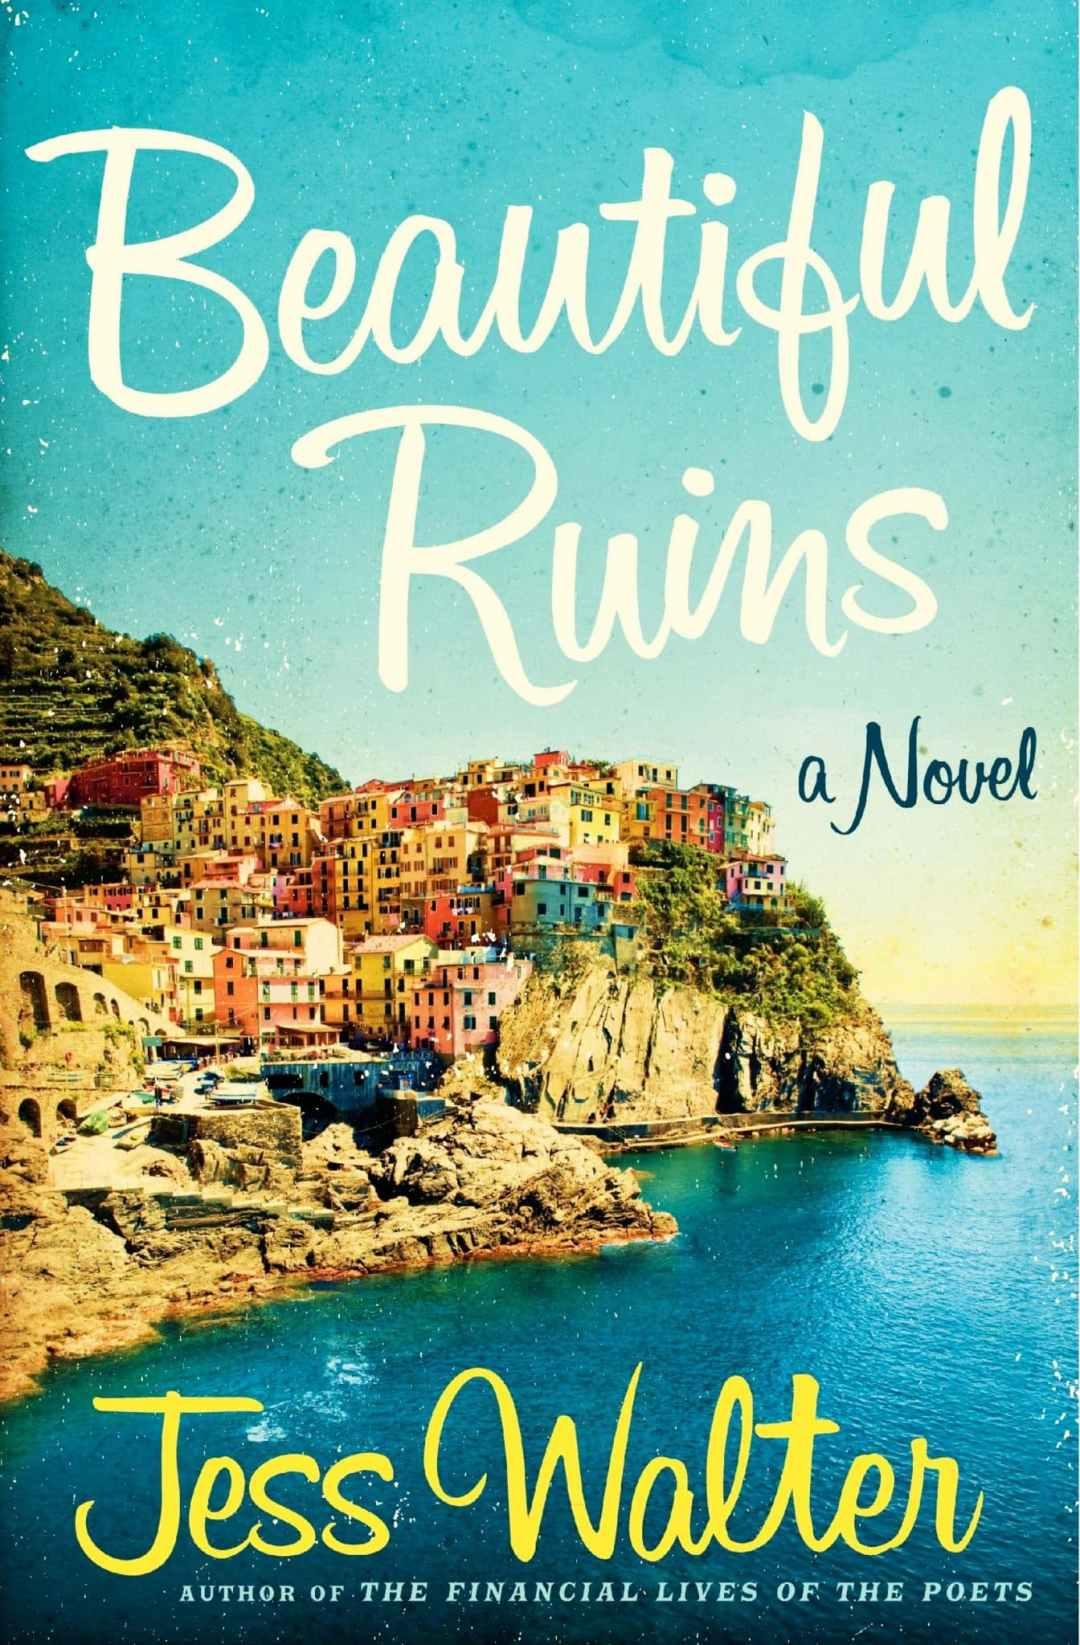 15 Beautiful Books Every Traveler Should Read